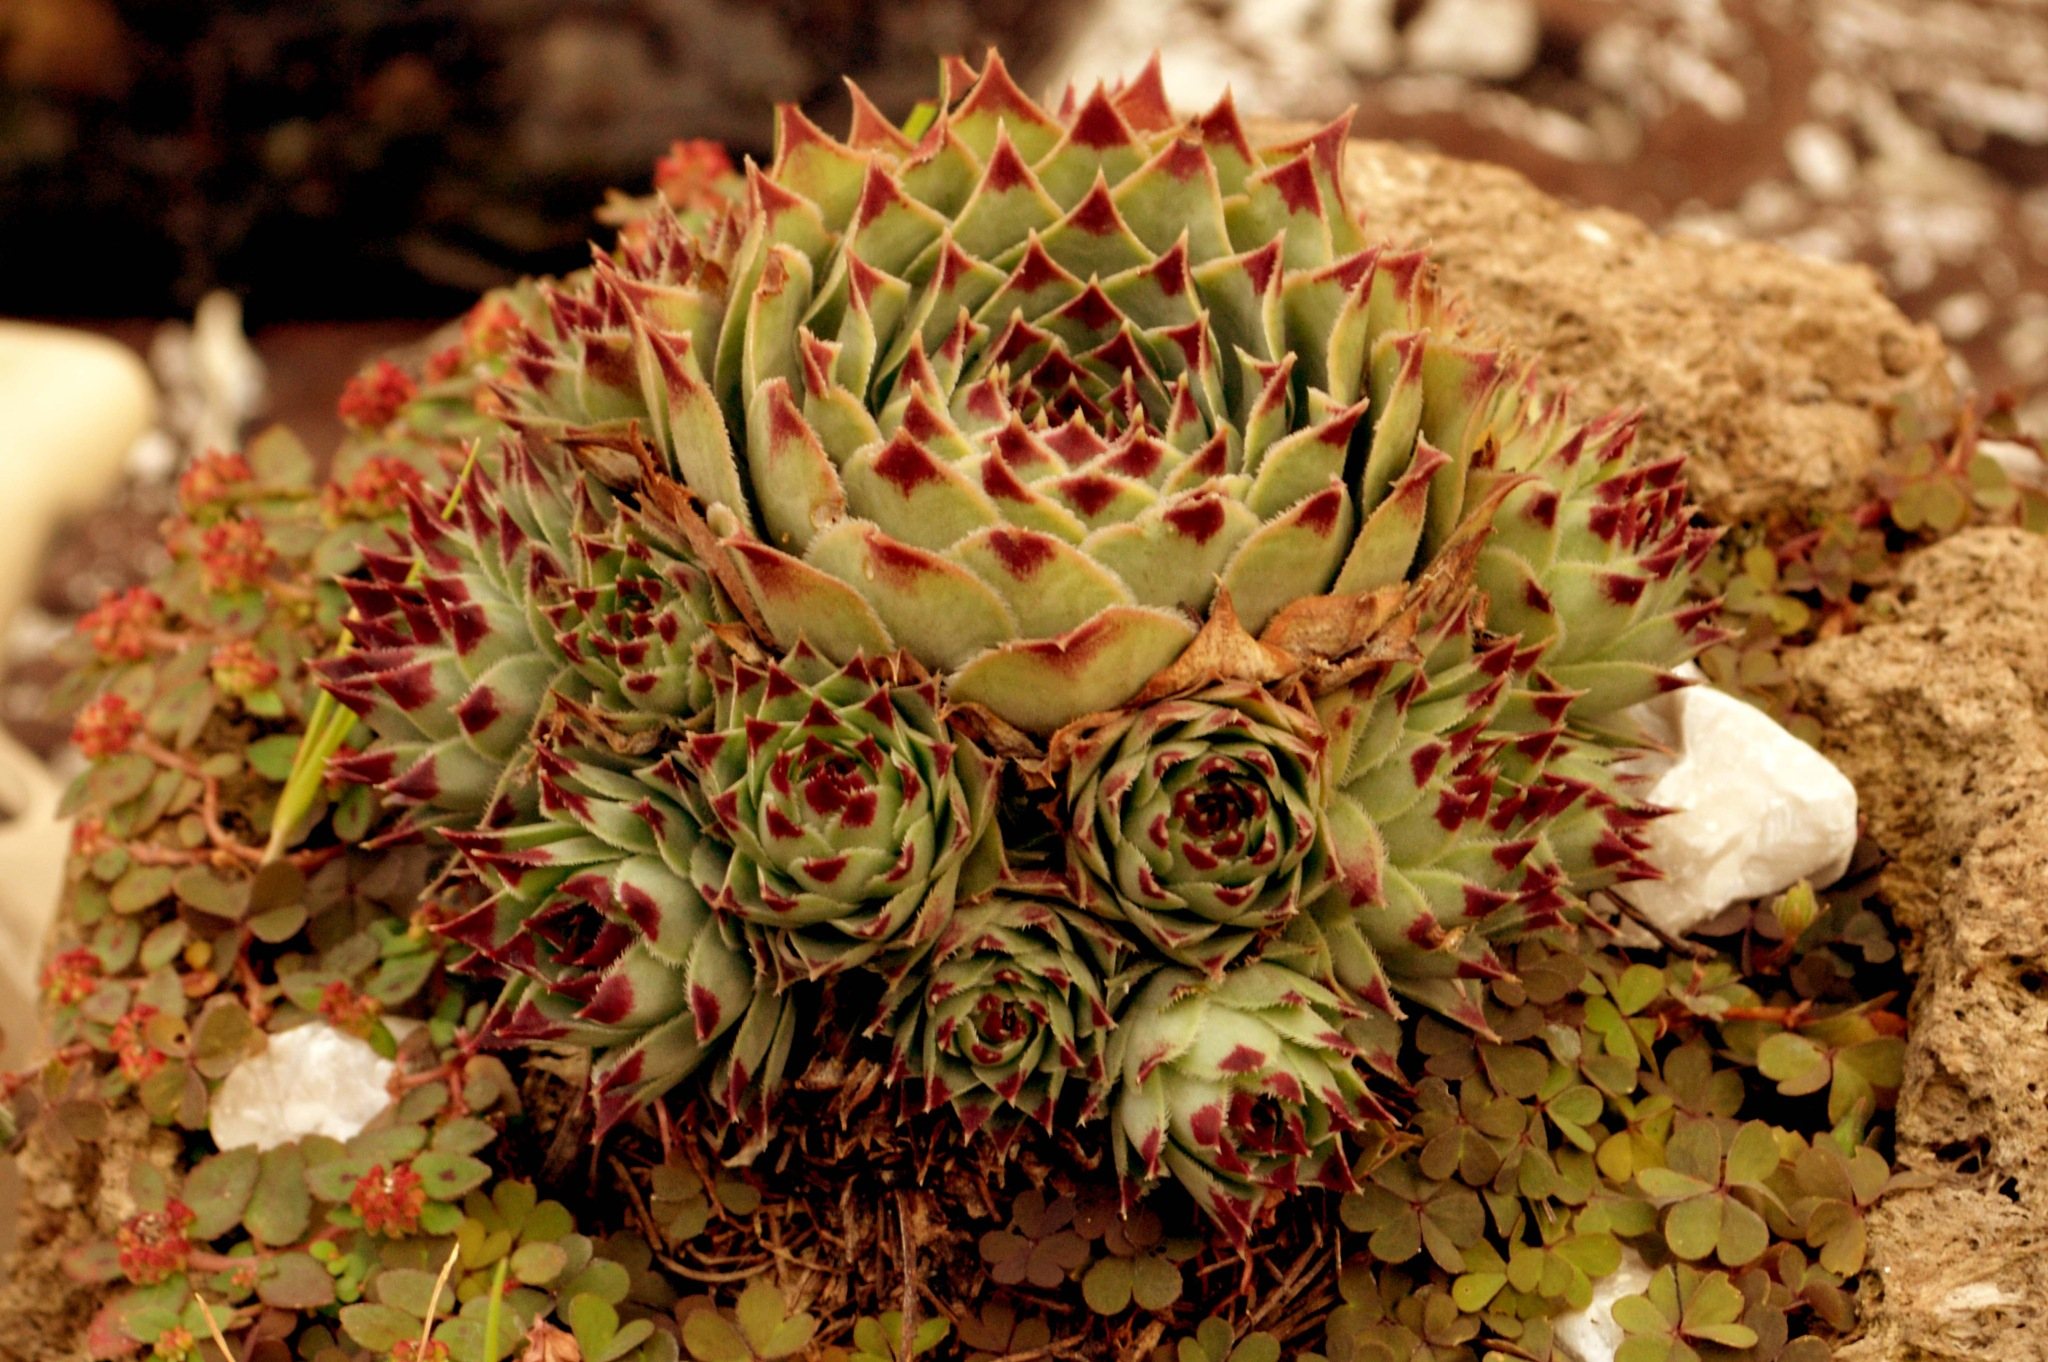 Cactus by Fernando